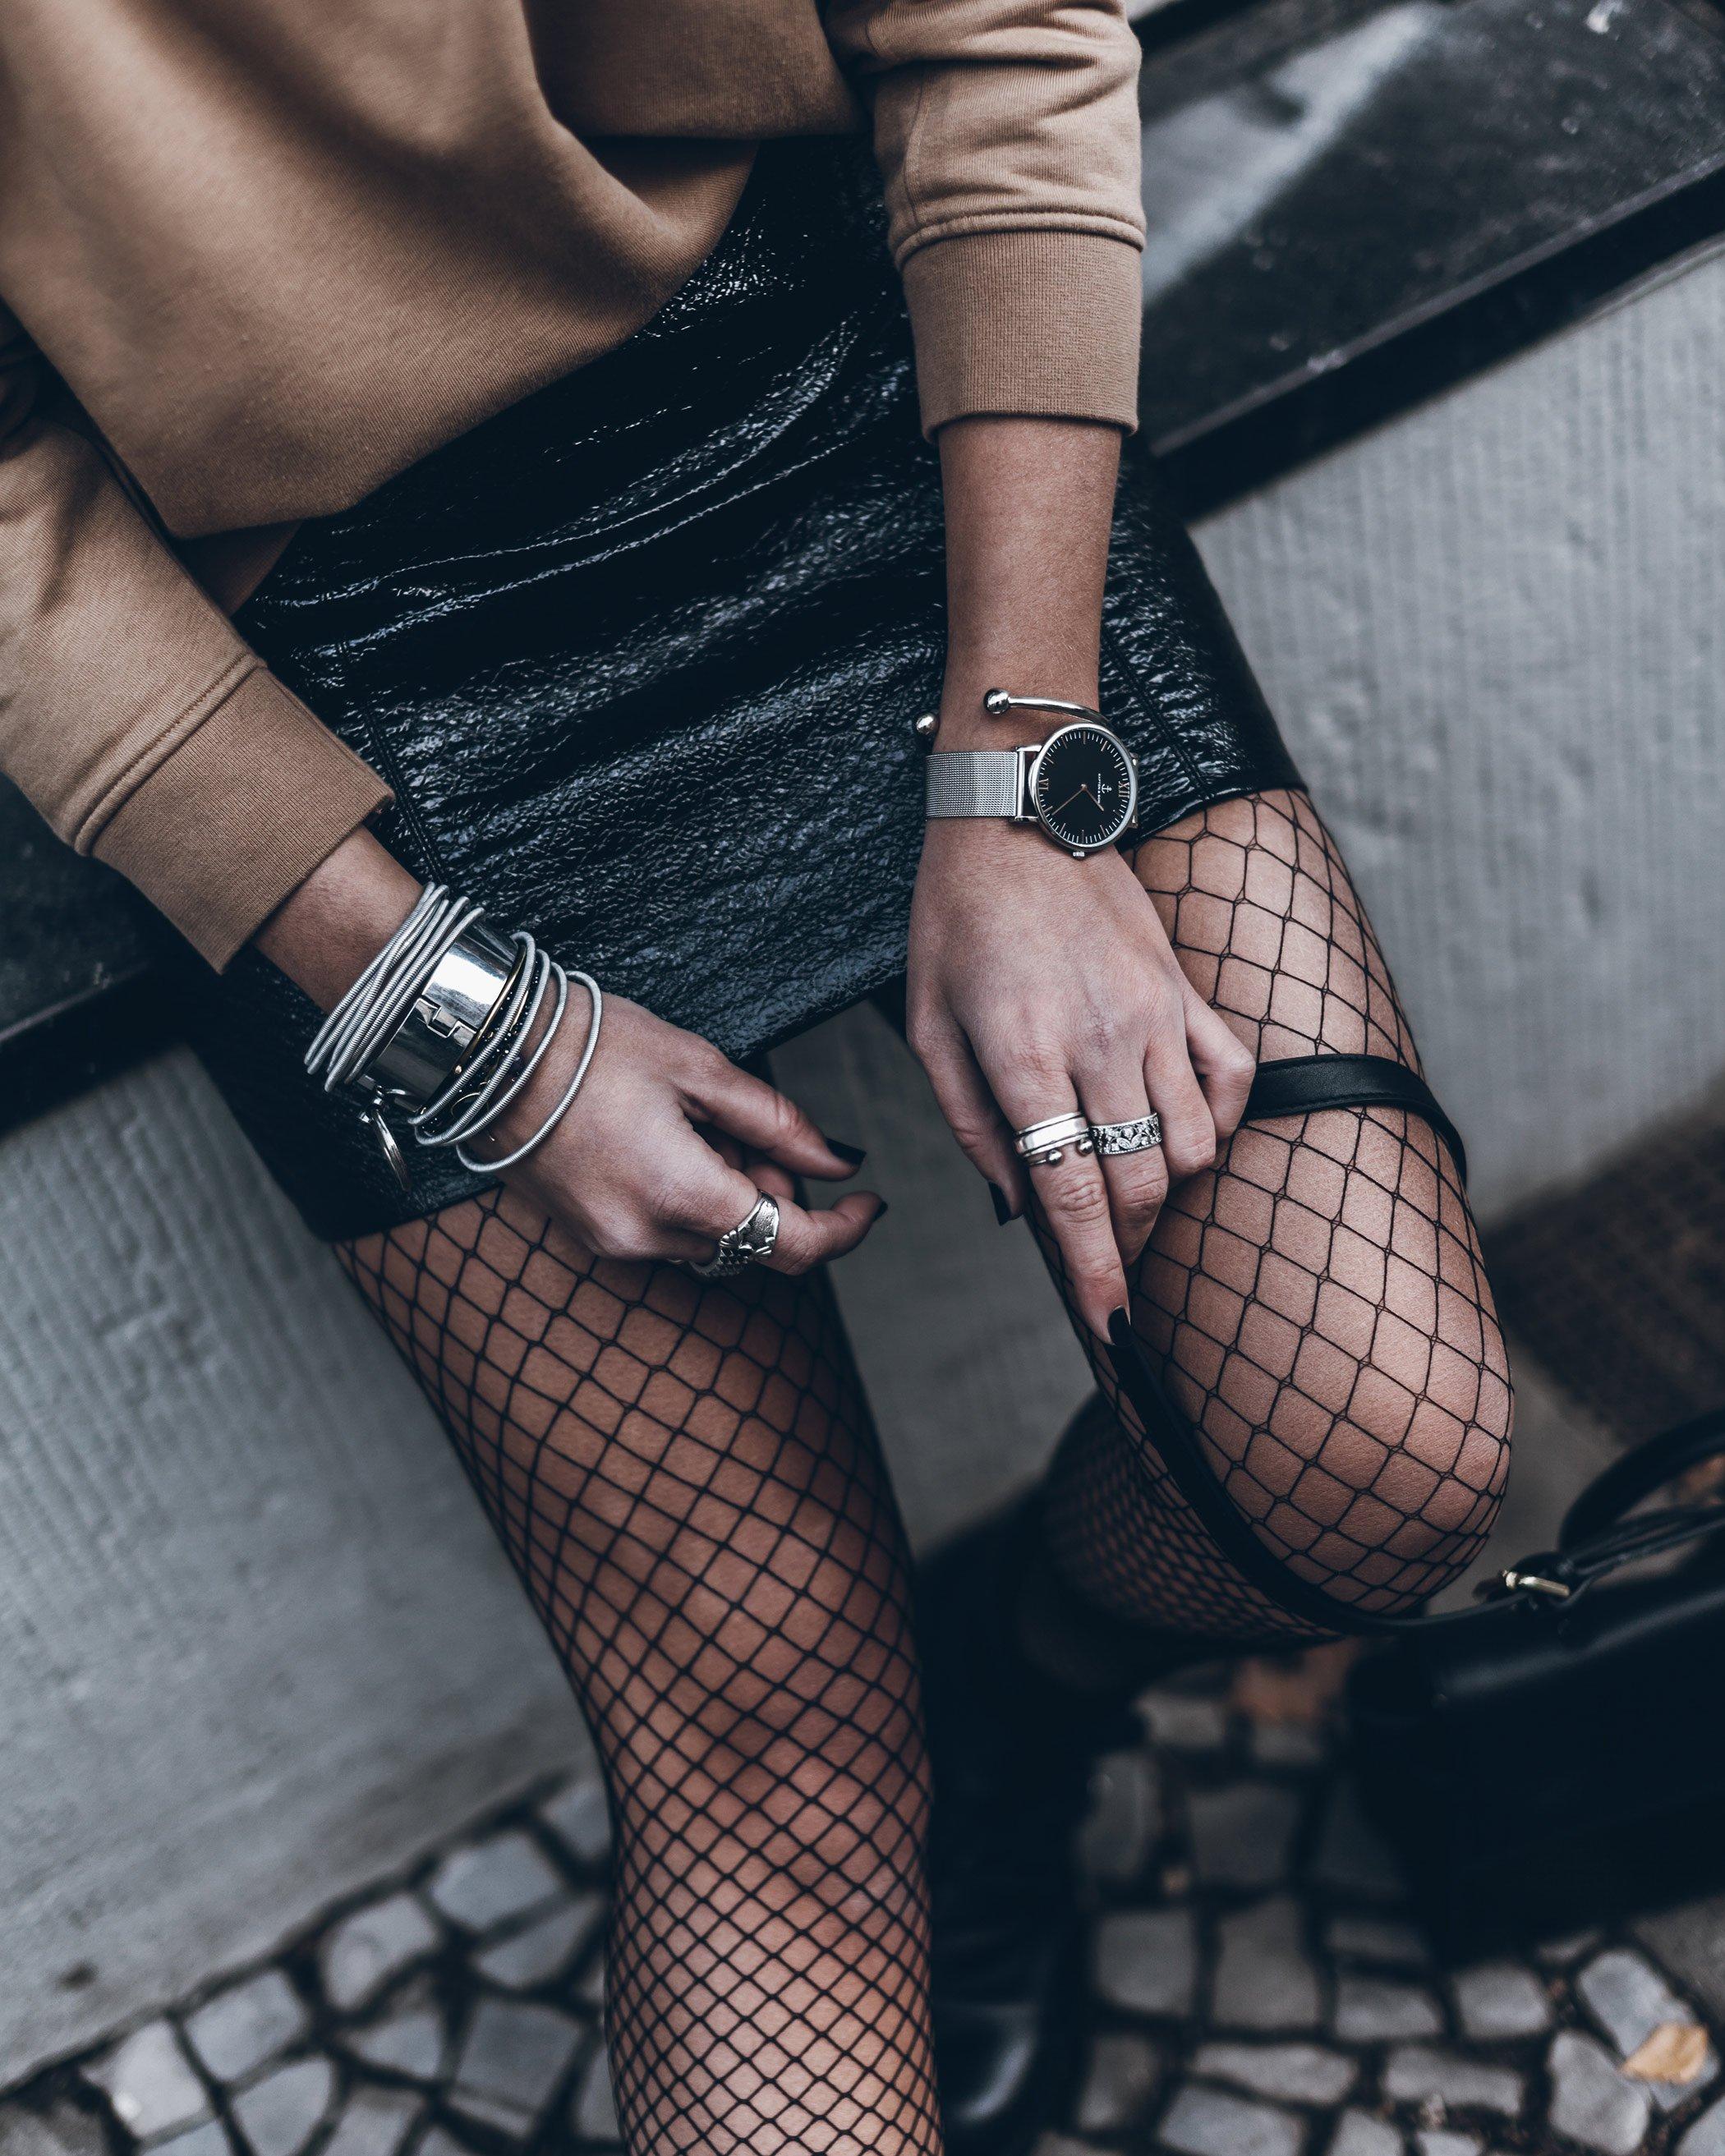 mikuta-patent-leather-skirt-11